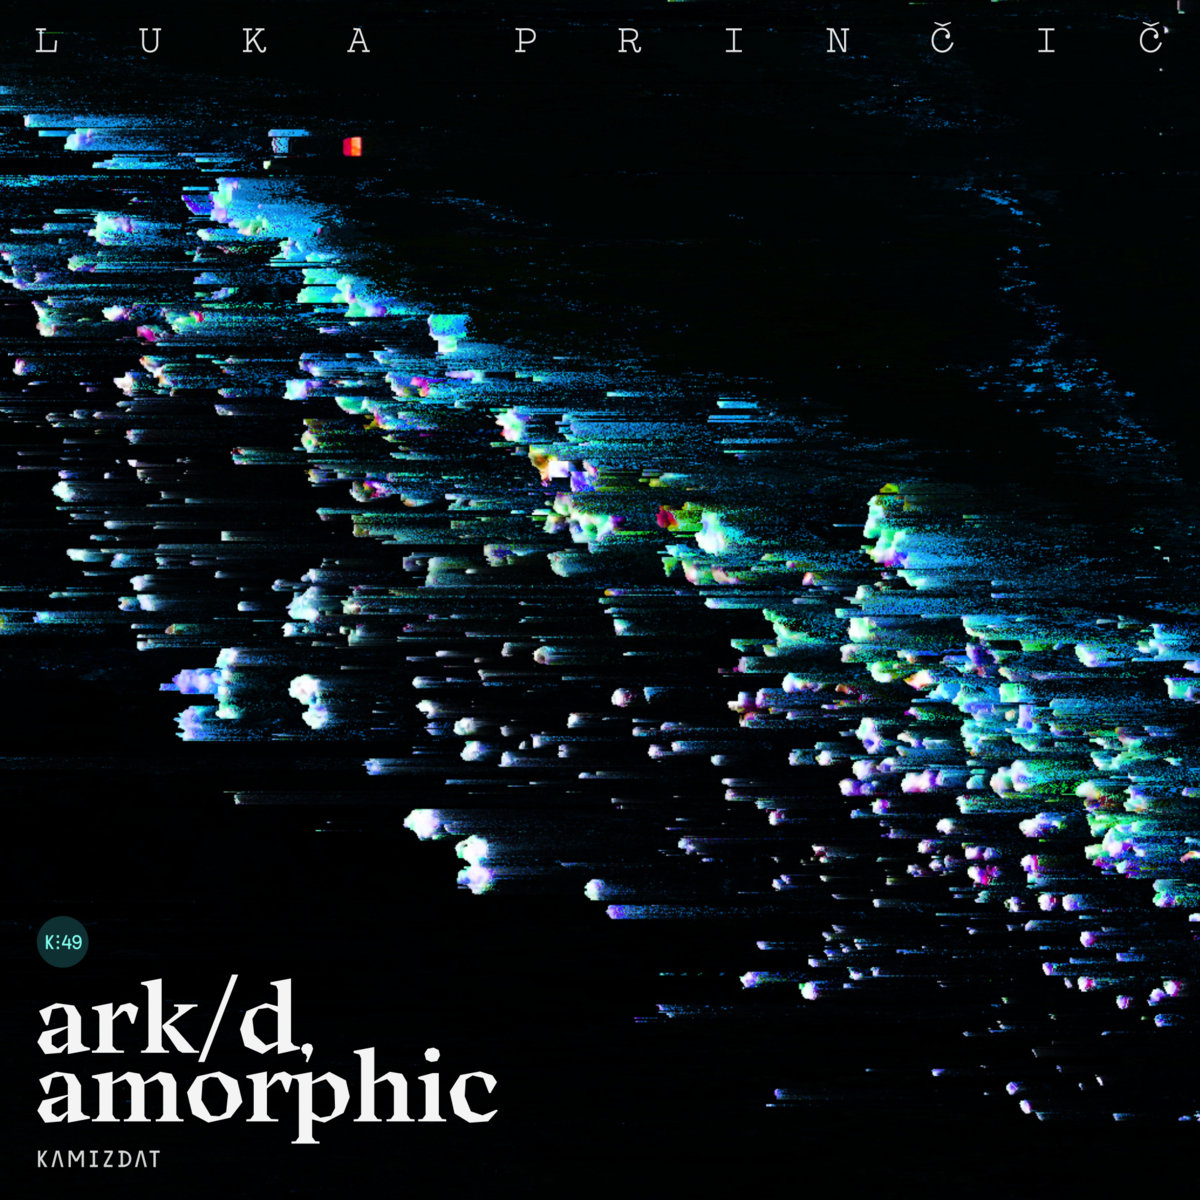 Luka Prinčič – ark/d, amorphic